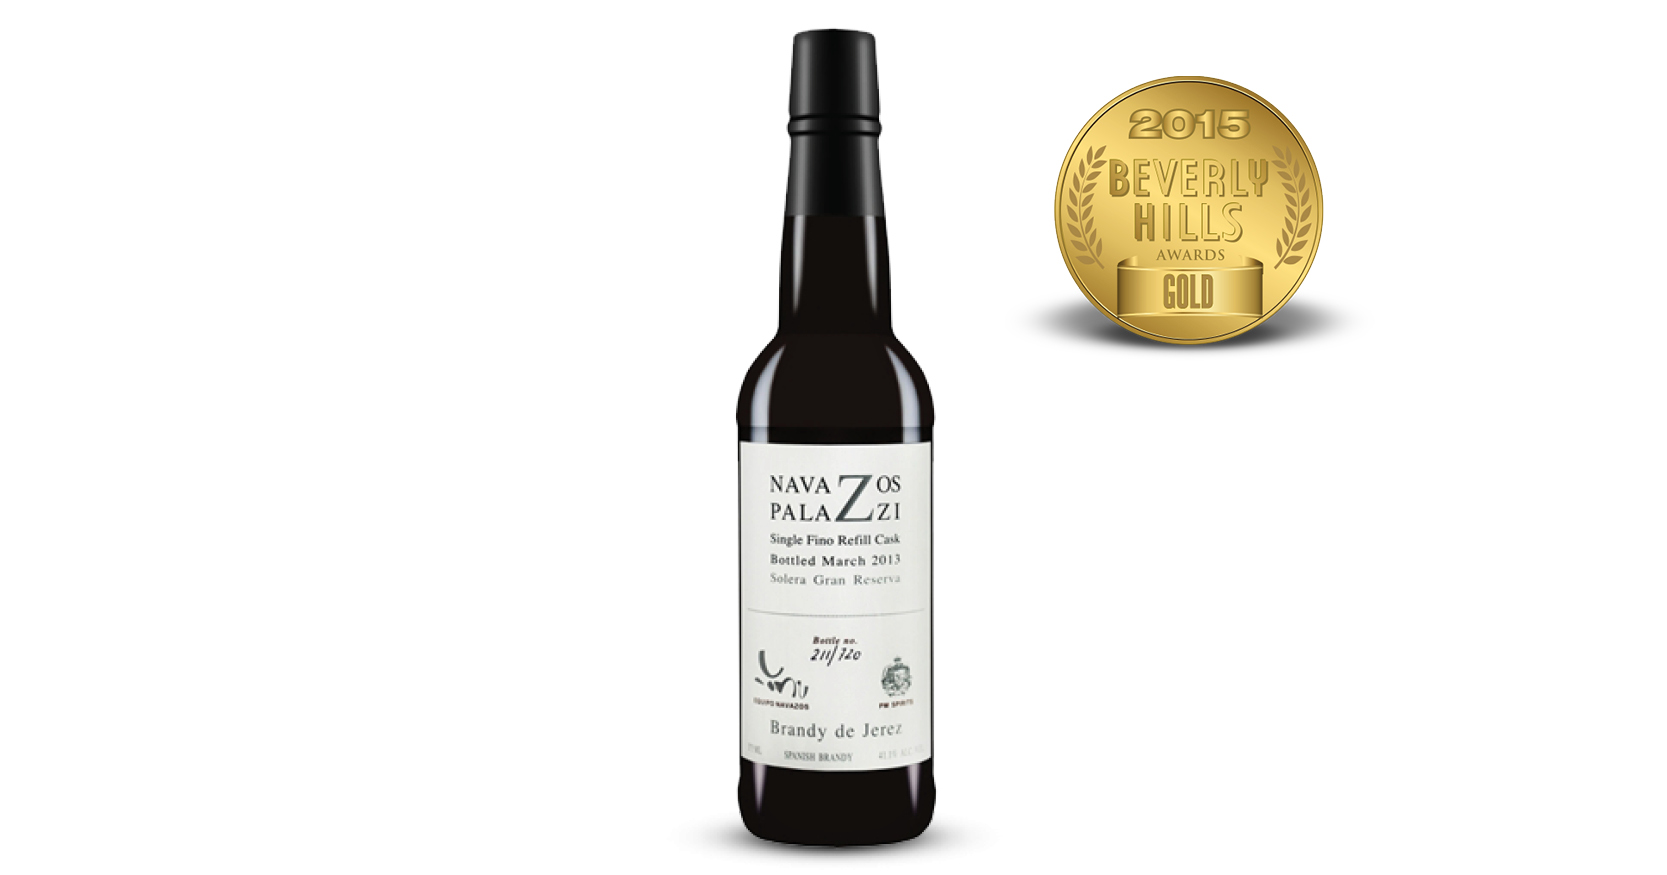 Navazos-Palazzi Jerez Brandy-Release #2 Single Fino Cask